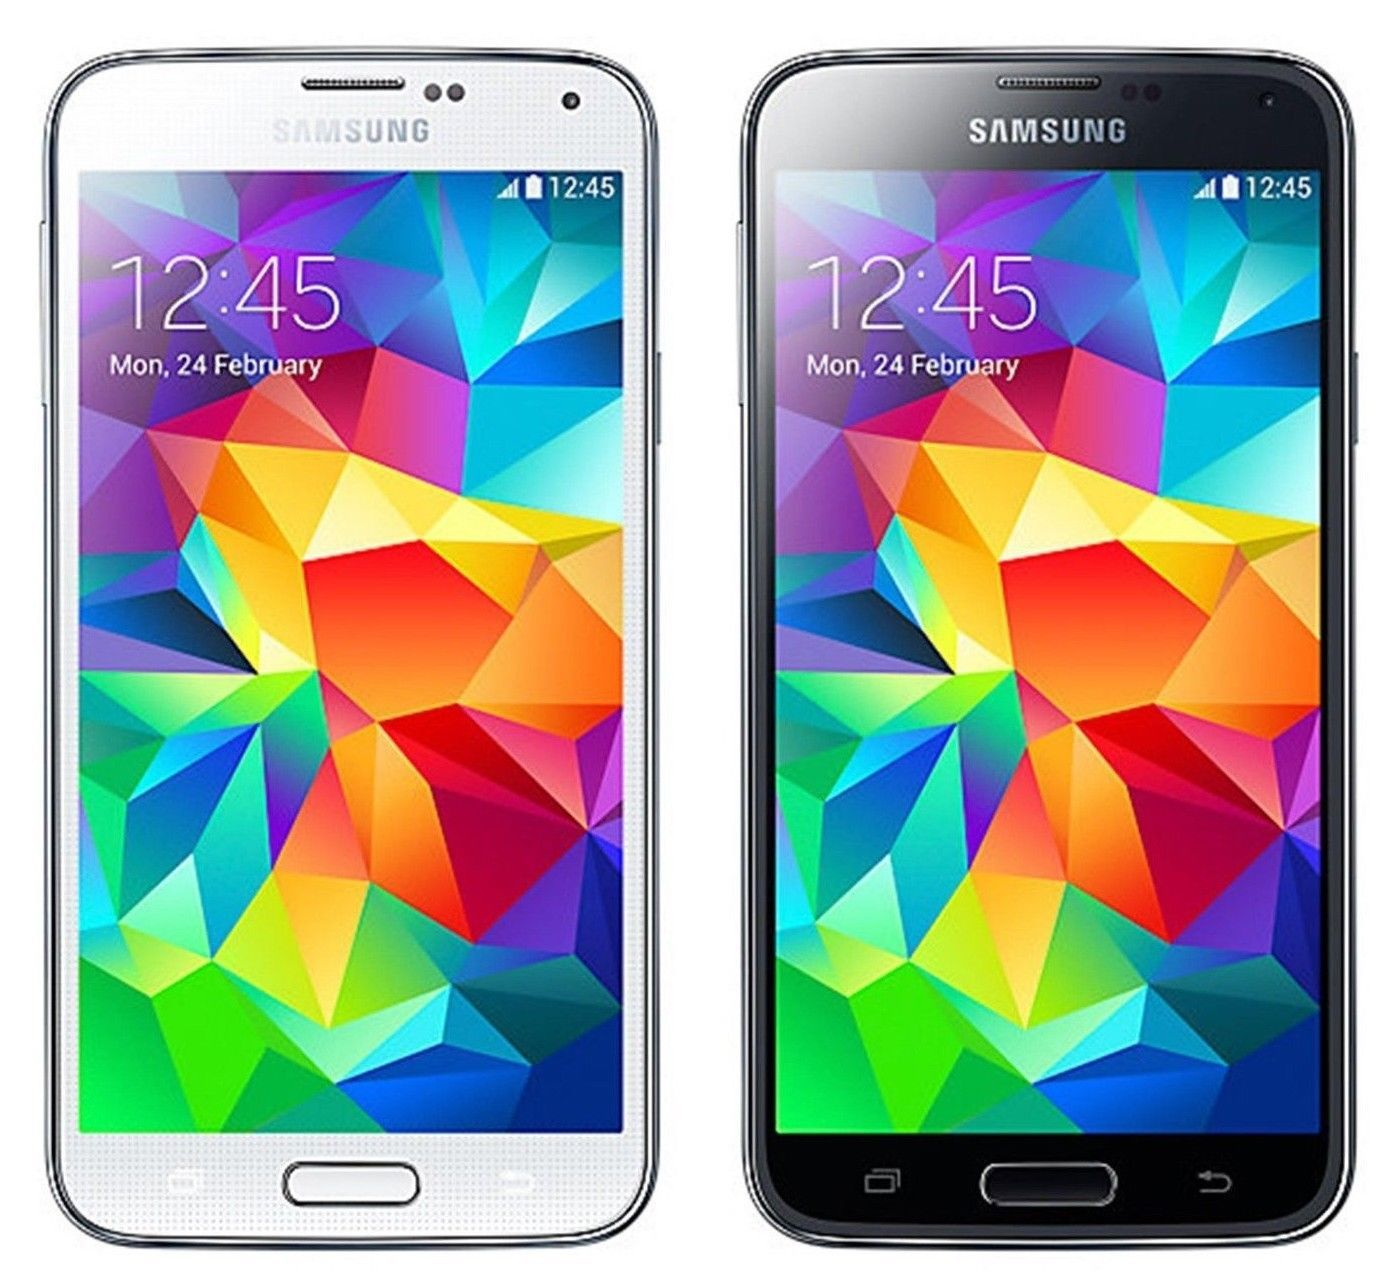 Samsung Galaxy S5   16GB 4G LTE (GSM UNLOCKED) Smartphone SM-G900W8